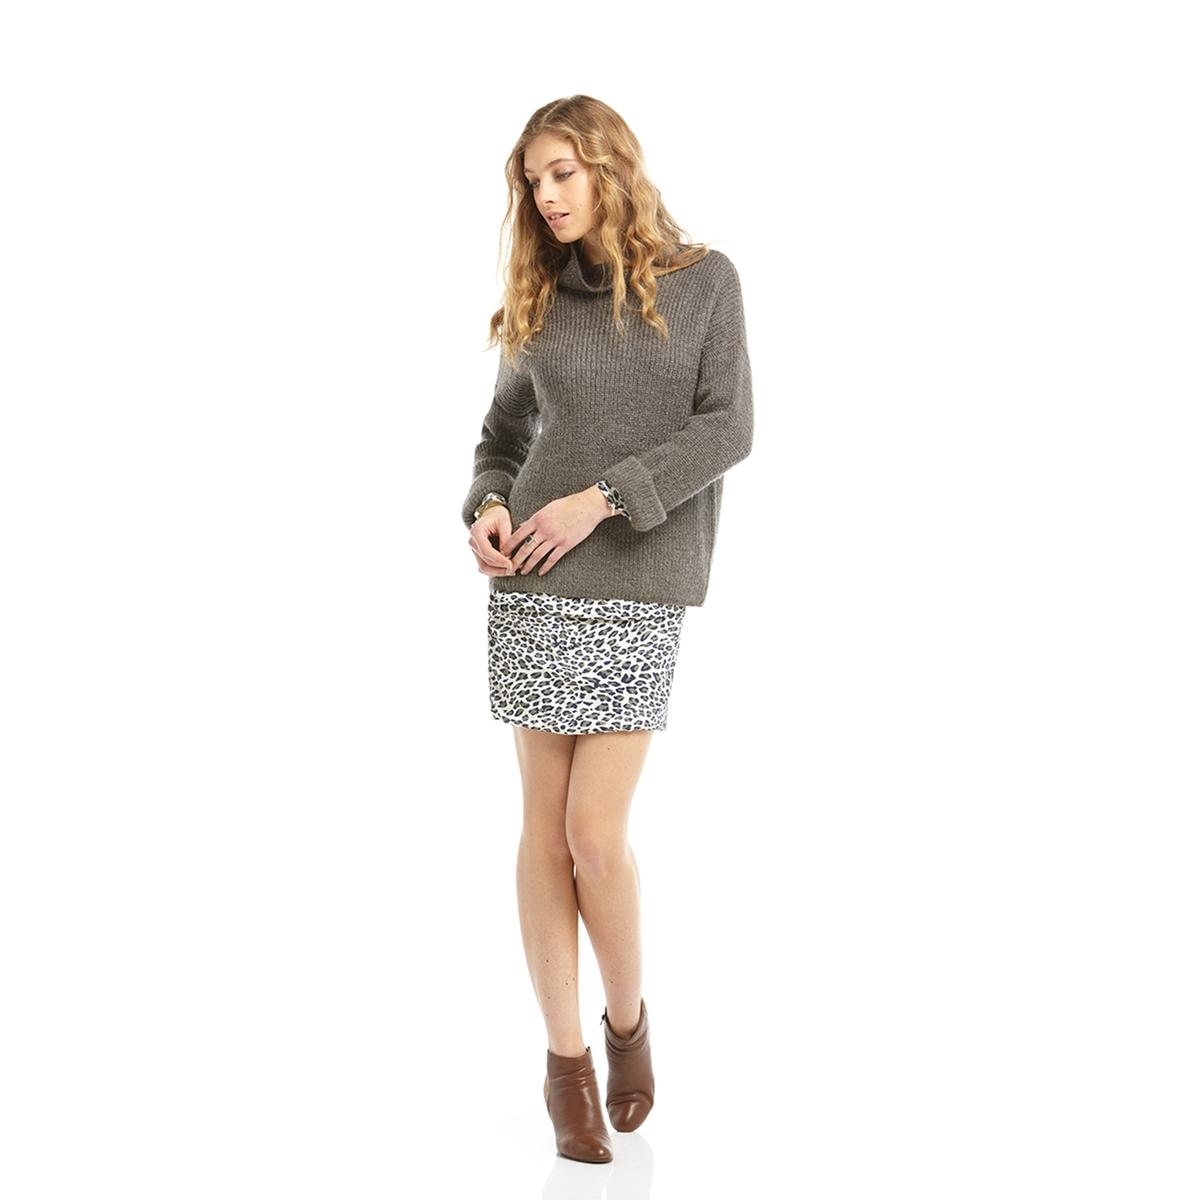 Пуловер с рукавами 7/8, 40% мохераСостав и описание:   Марка:       CHARLISE.   Материал:      40% мохера, 37% полиамида, 23% акрила.<br><br>Цвет: антрацит<br>Размер: L